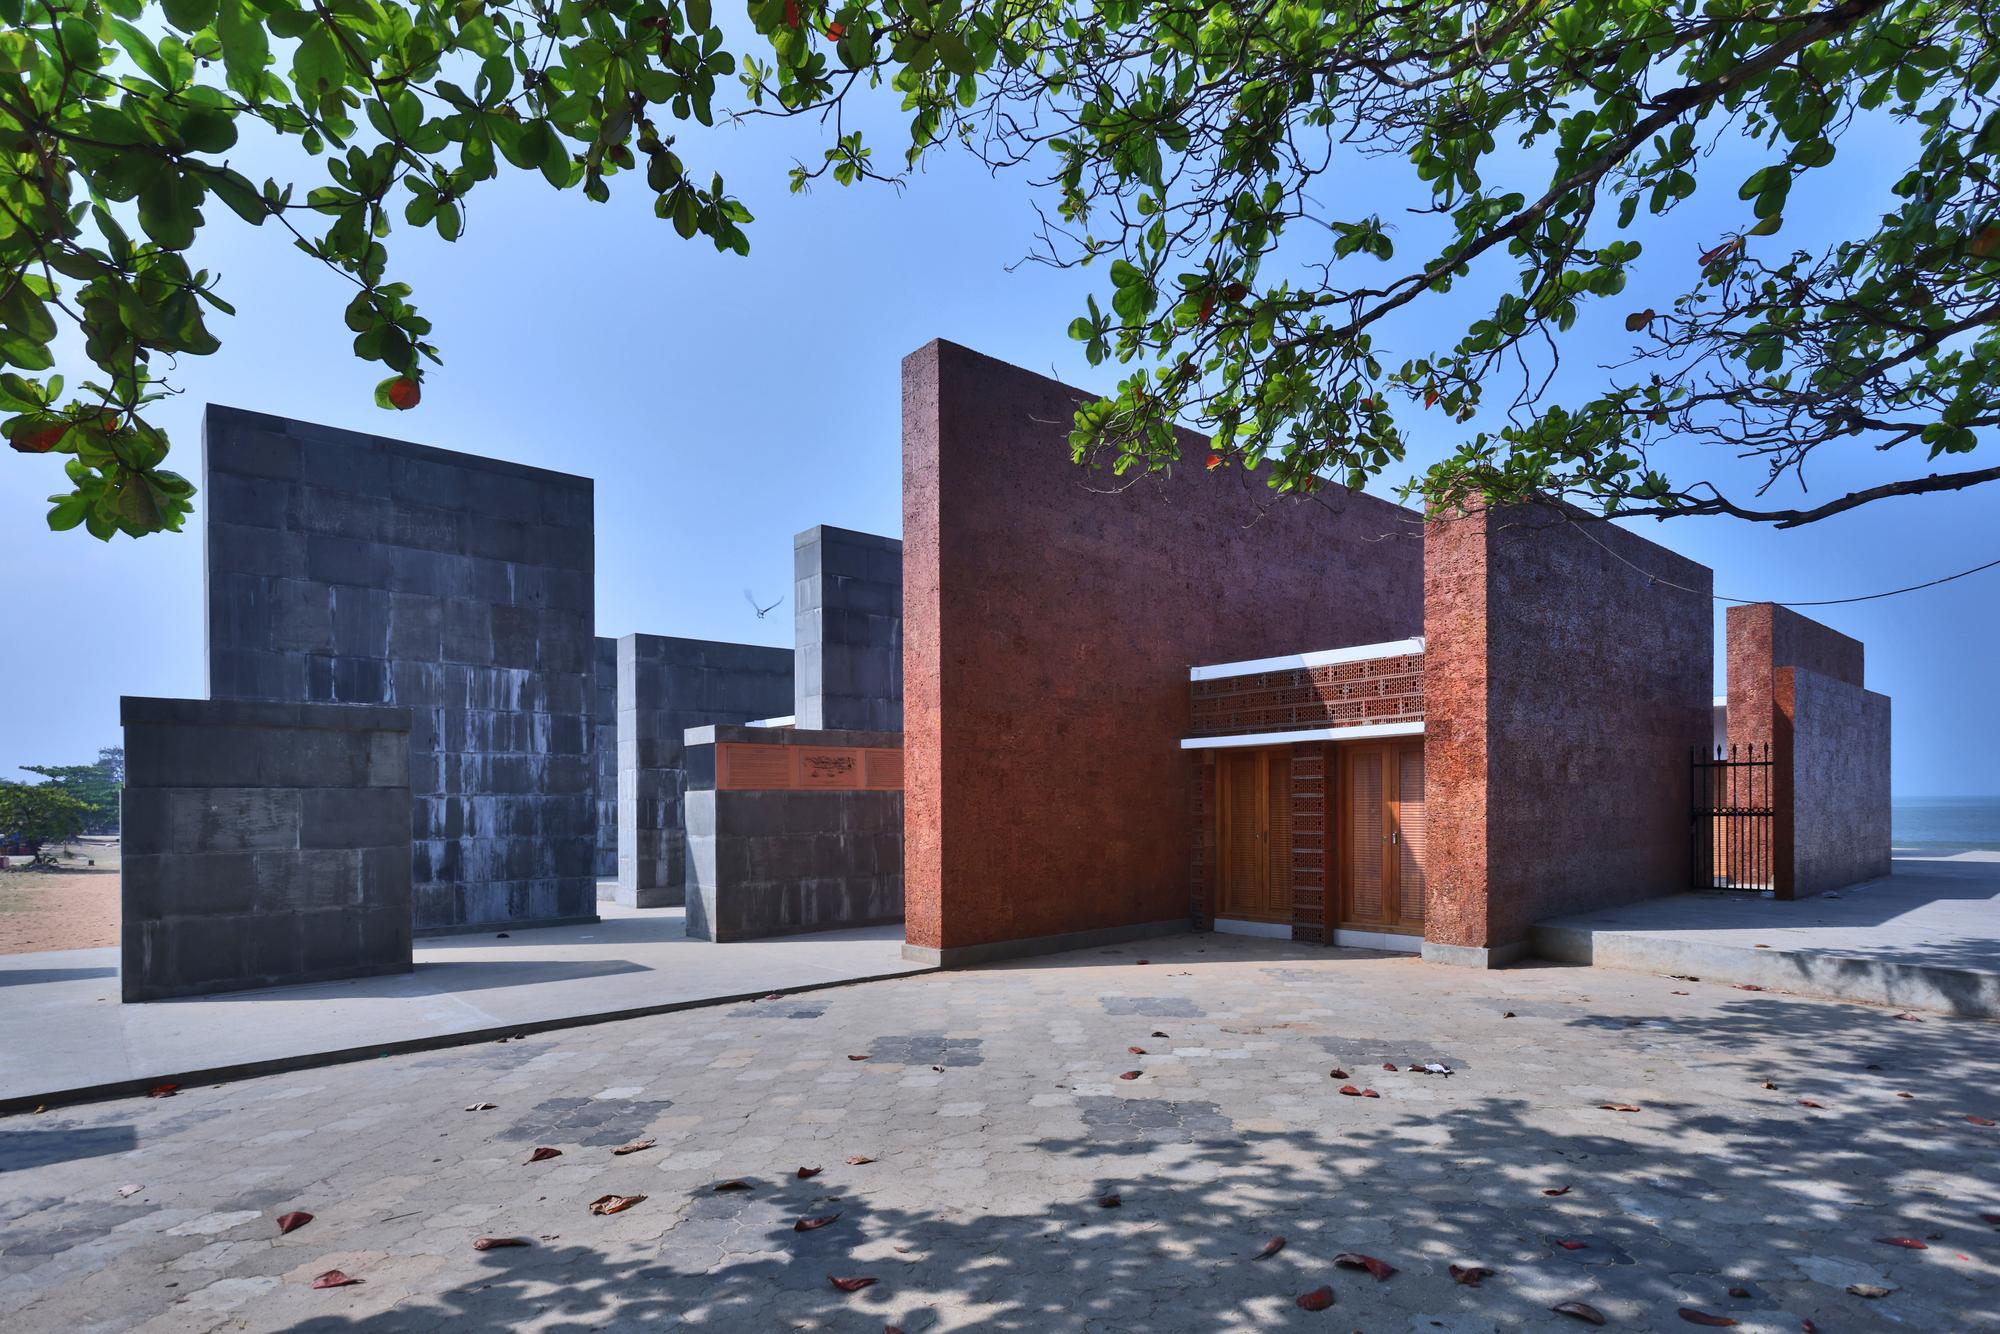 Freedom Square / De_earth Architects